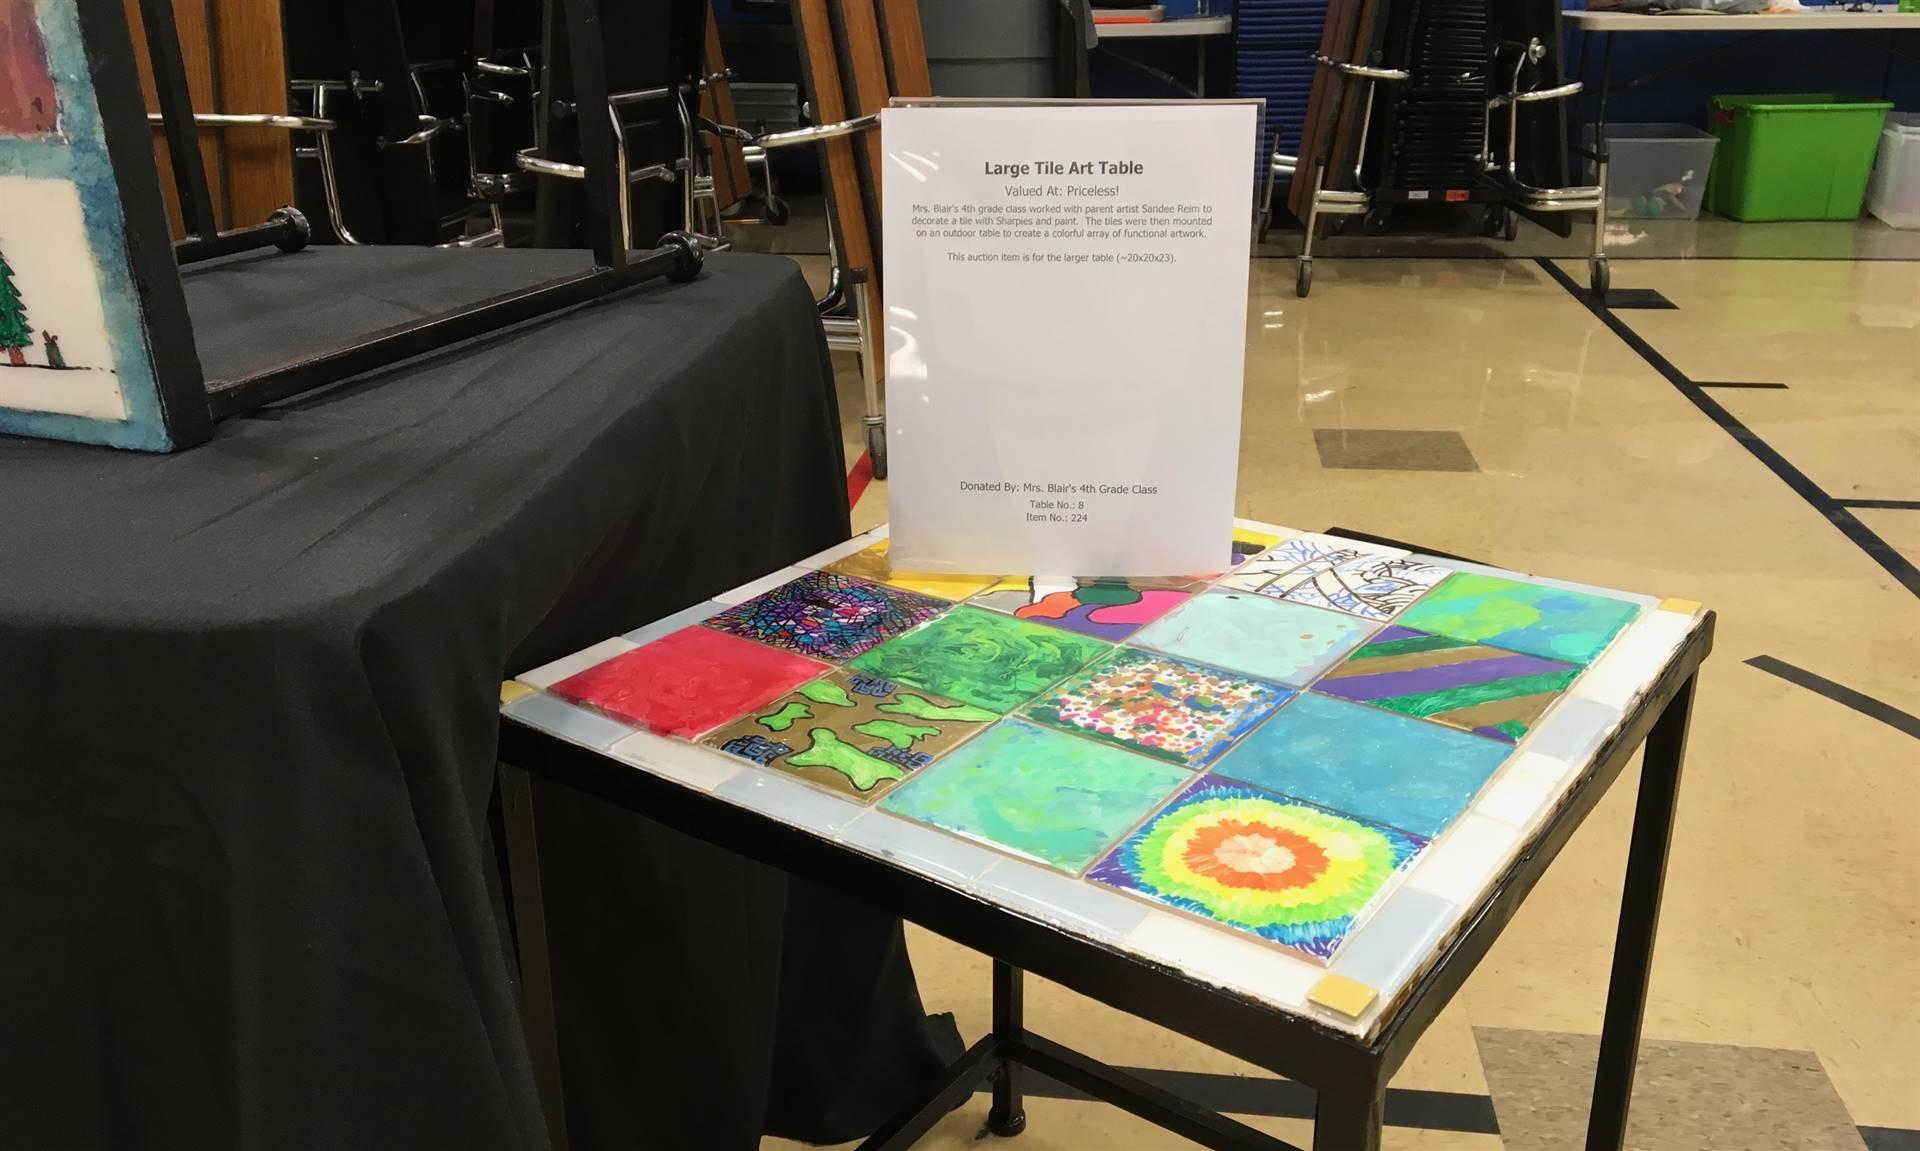 Informal Affair Art Project: Large Tile Art Table